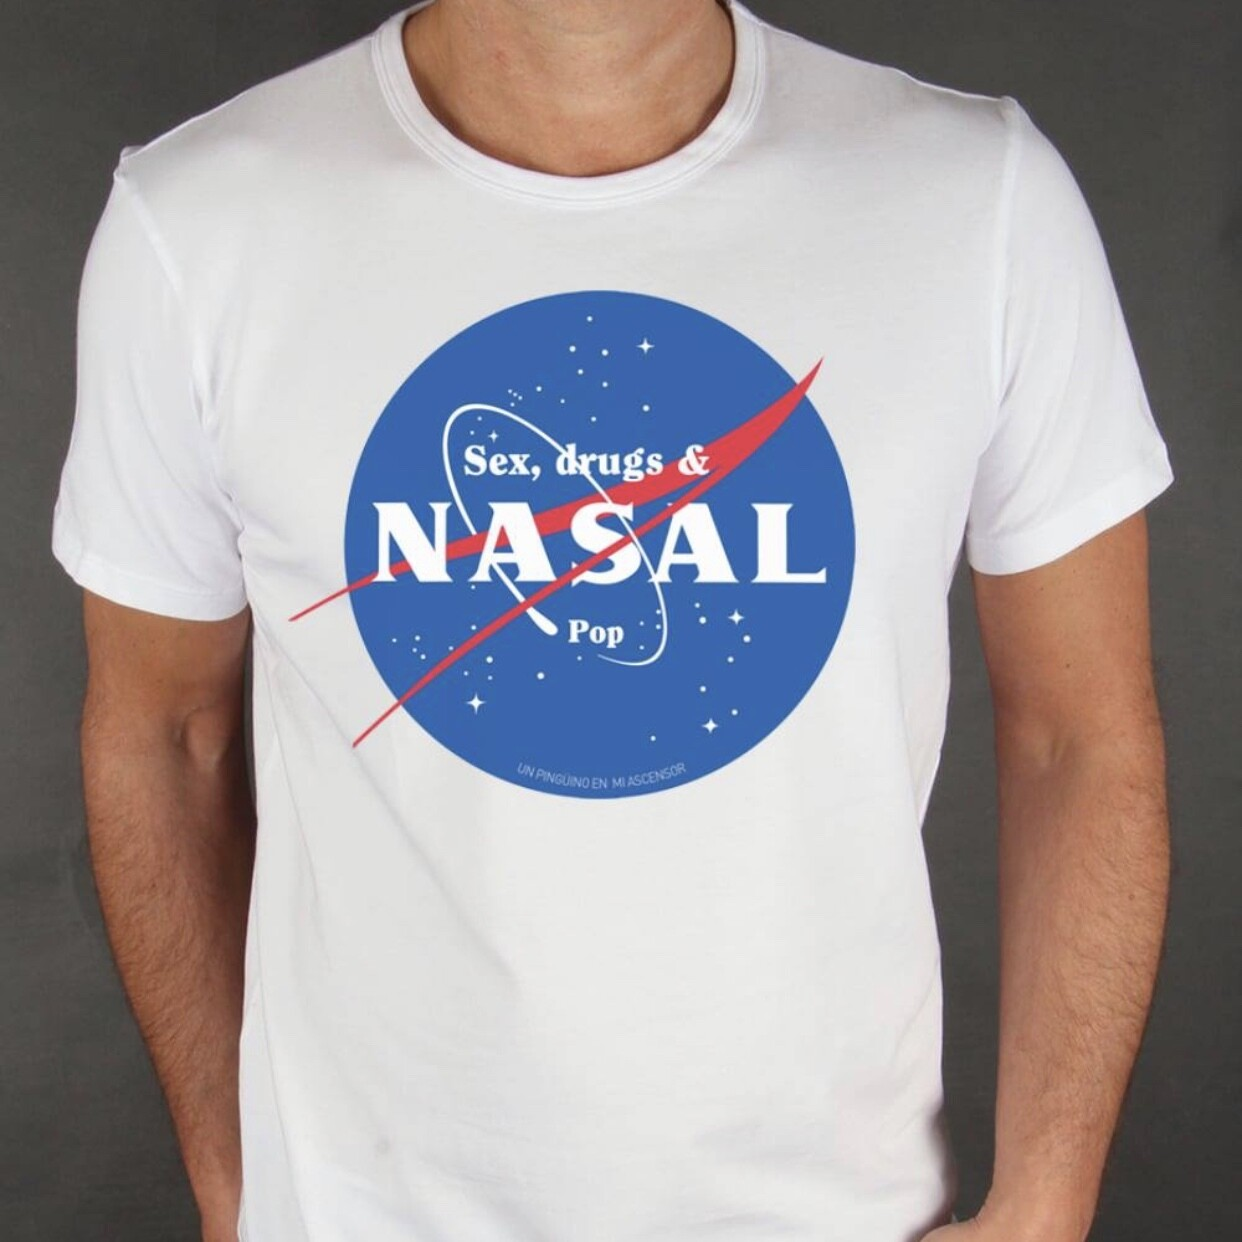 Sex, Drugs&Nasal Pop. Camiseta 30 aniversario